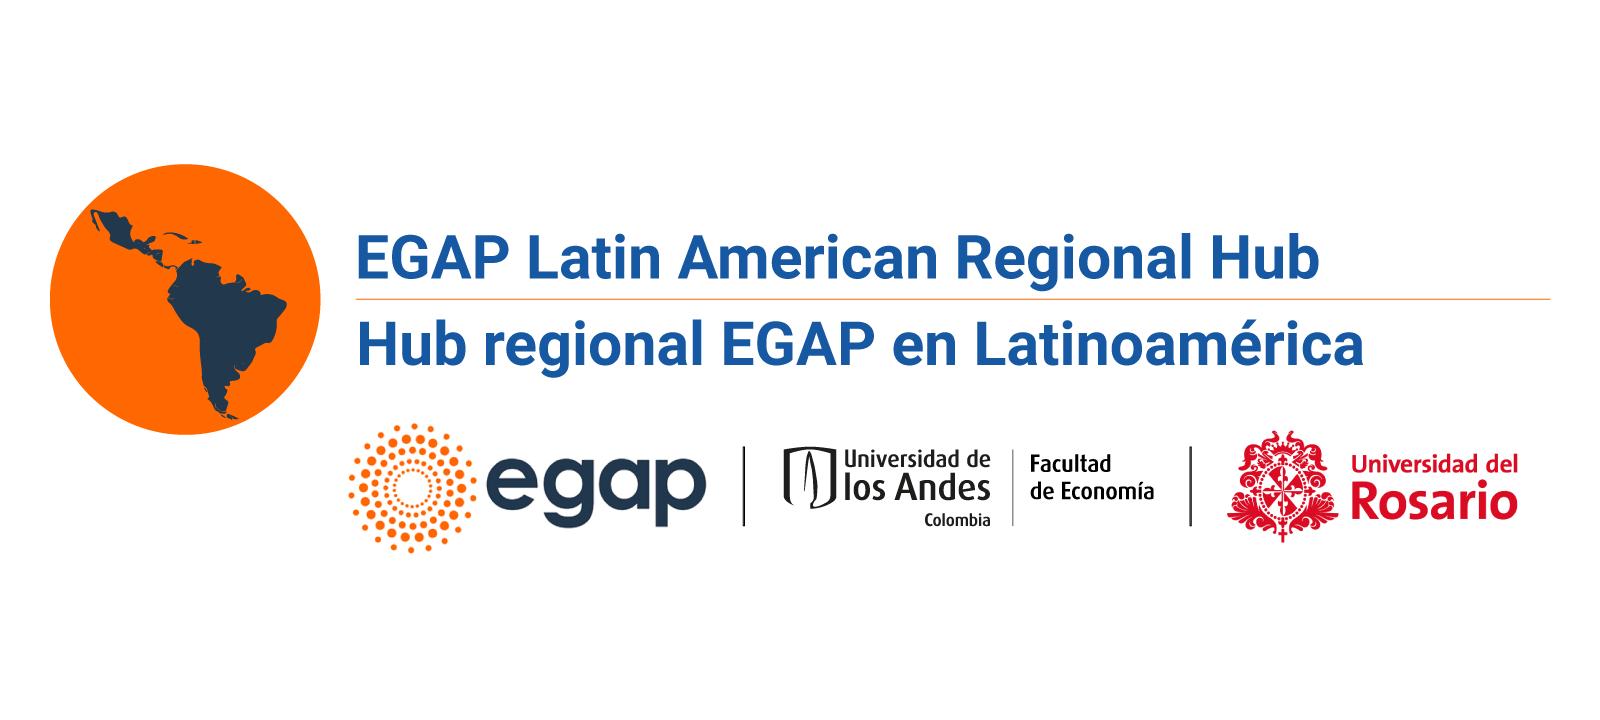 EGAP's-Latin-American-Regional-Hub.png